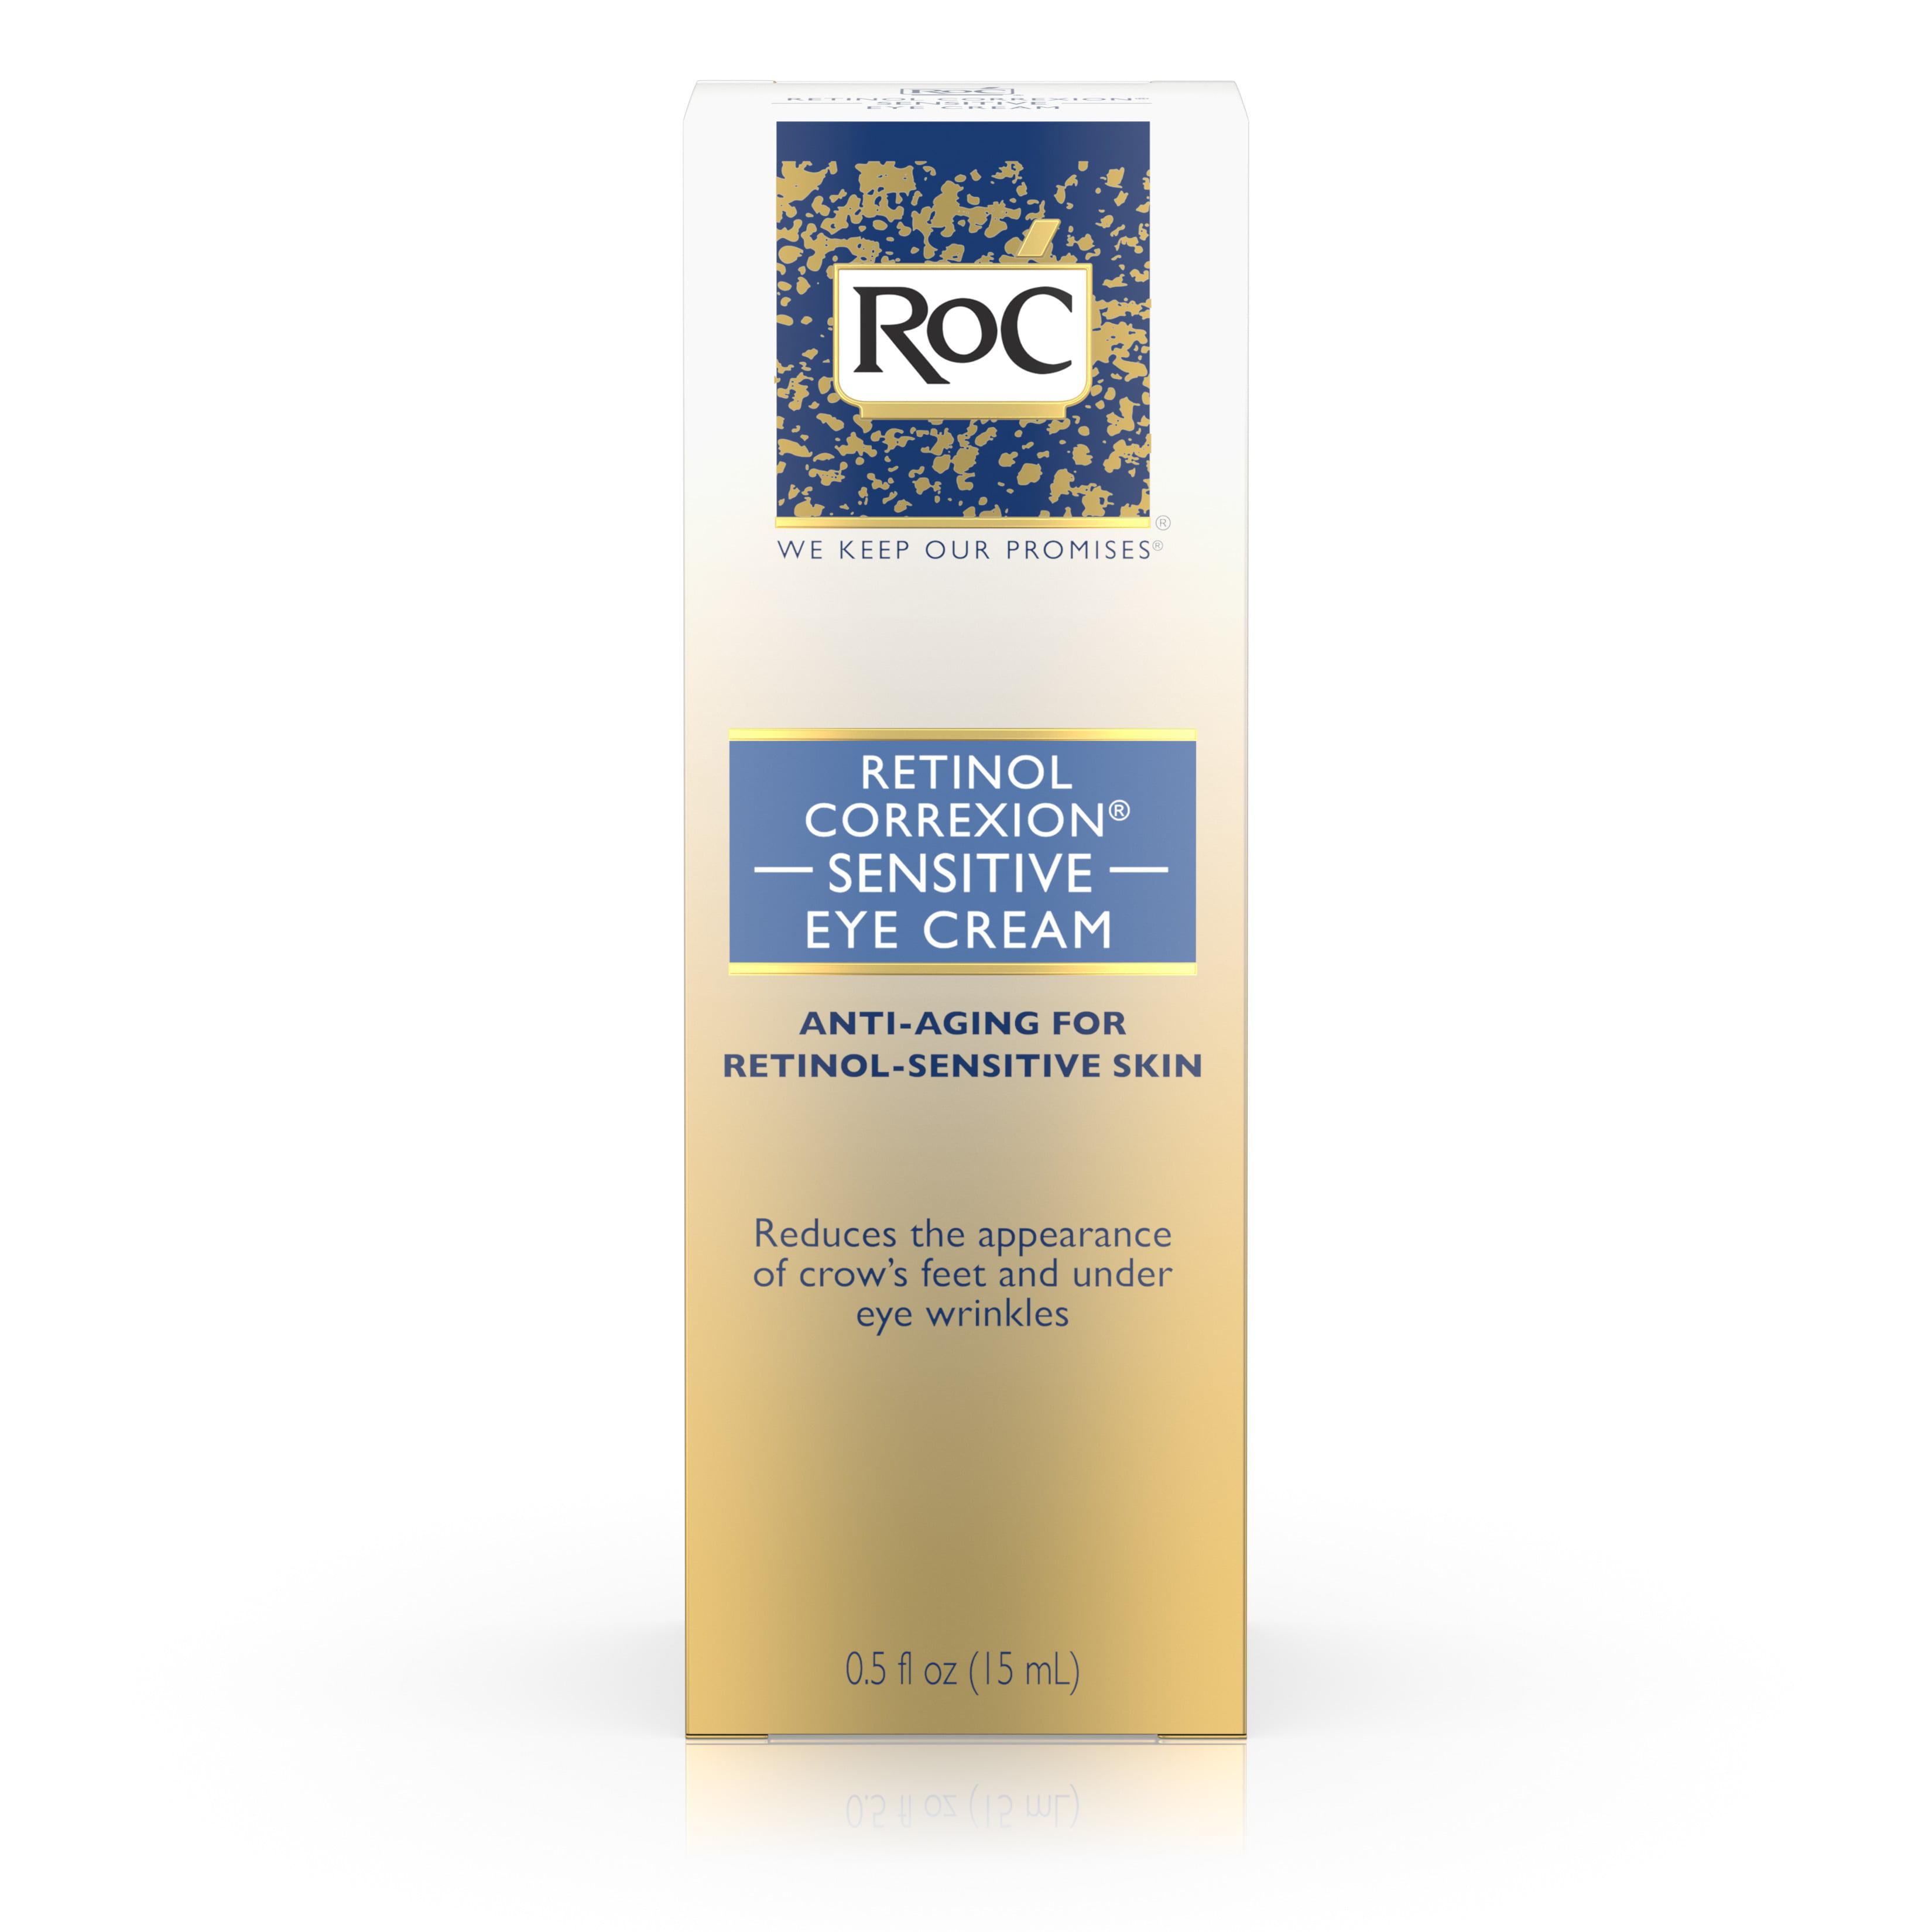 Roc retinol sensitive